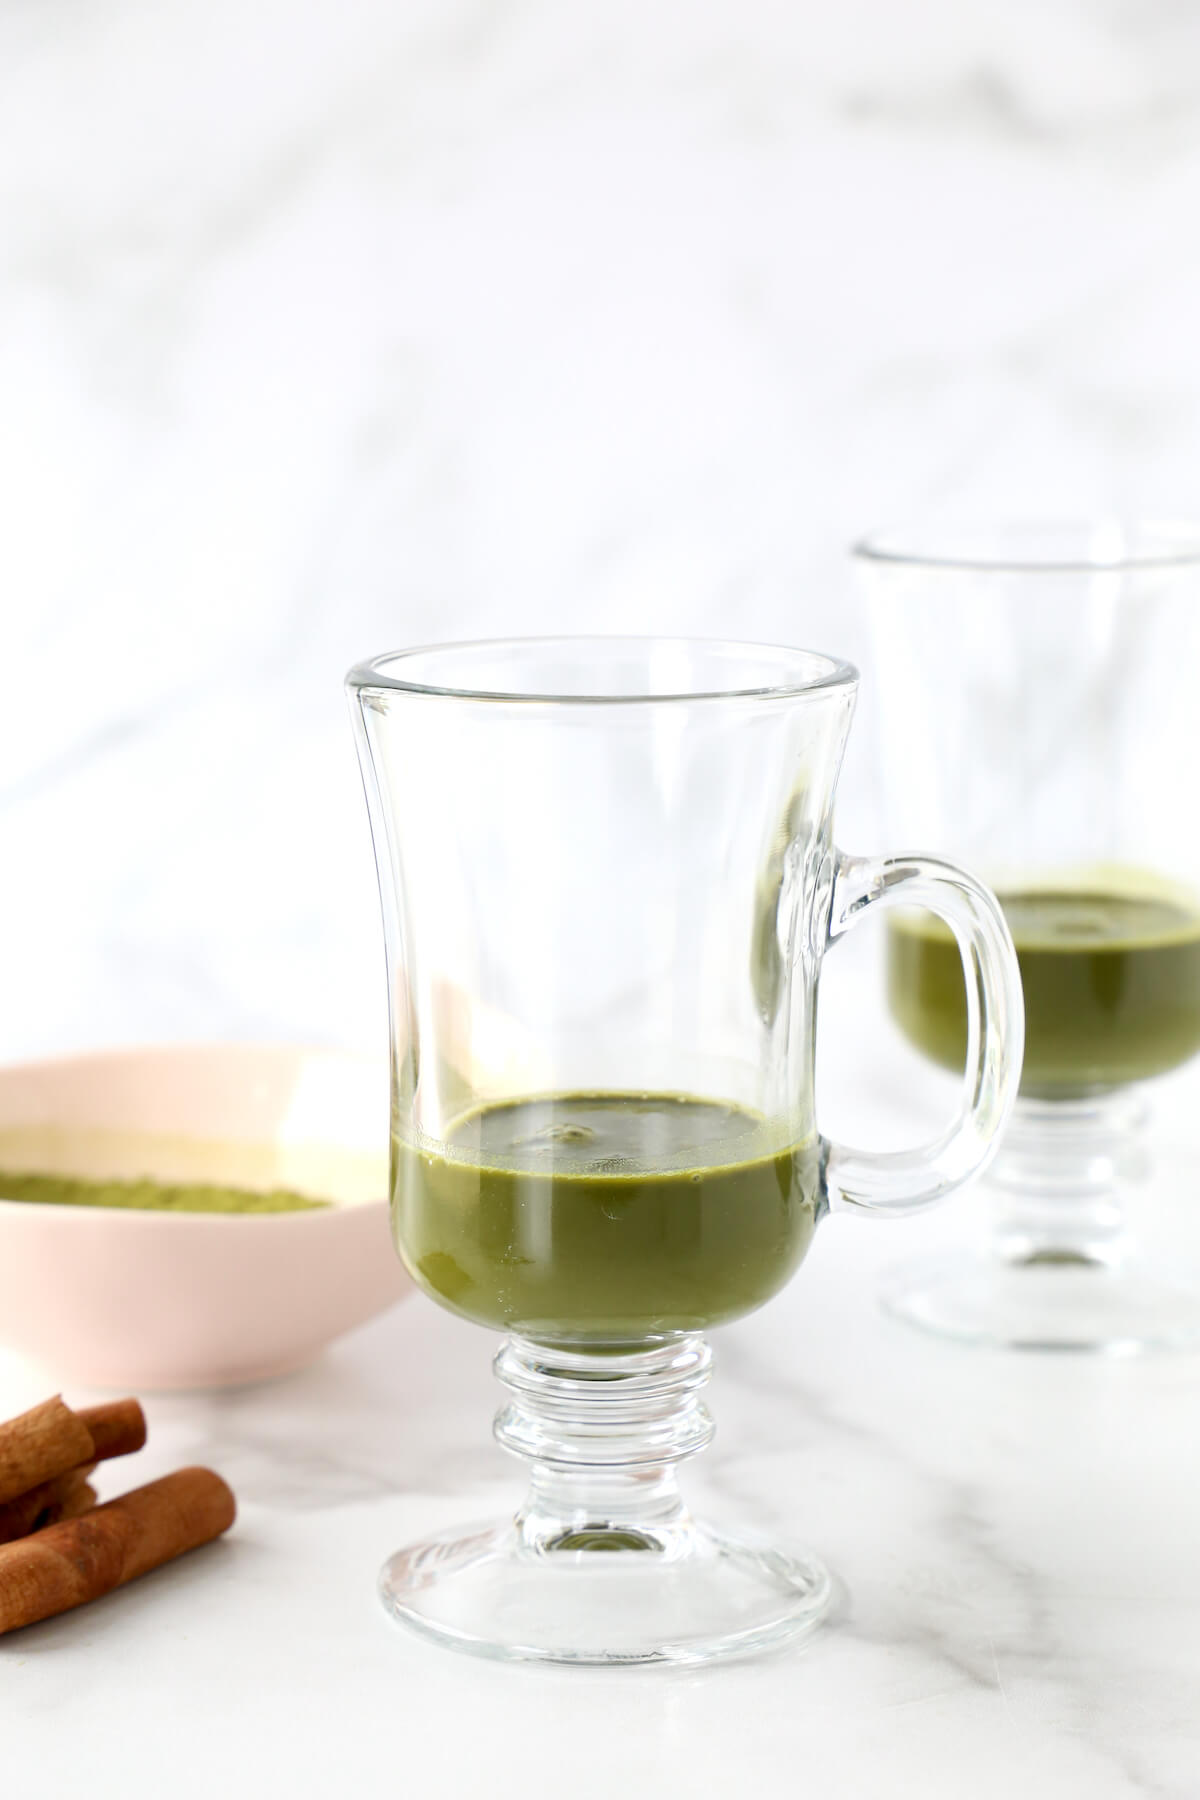 a glass of matcha tea